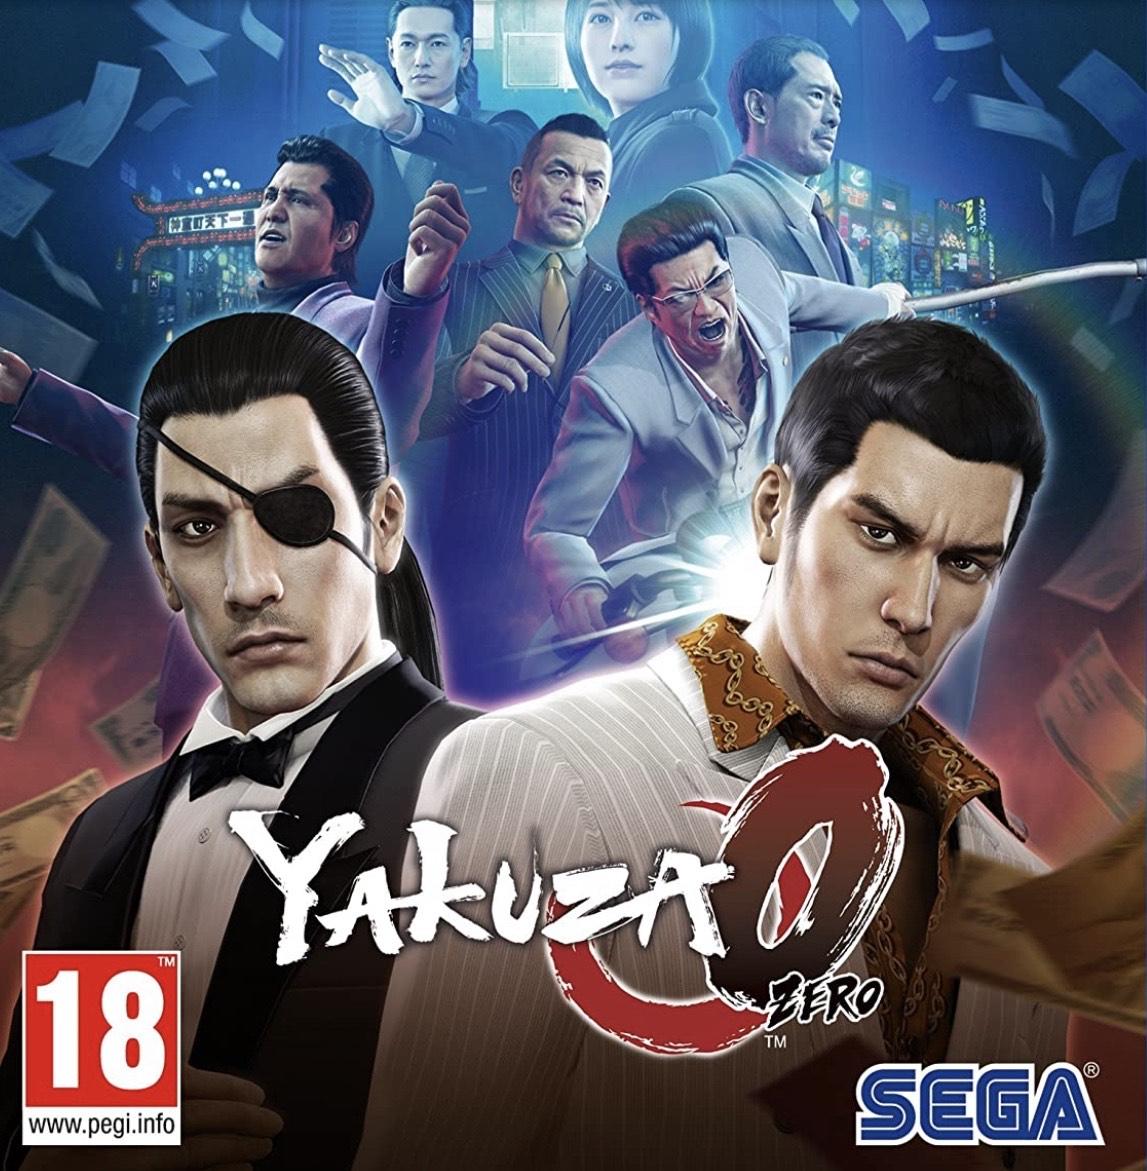 Yakuza 0 (Xbox One) - £9.74 with gold @ Microsoft store